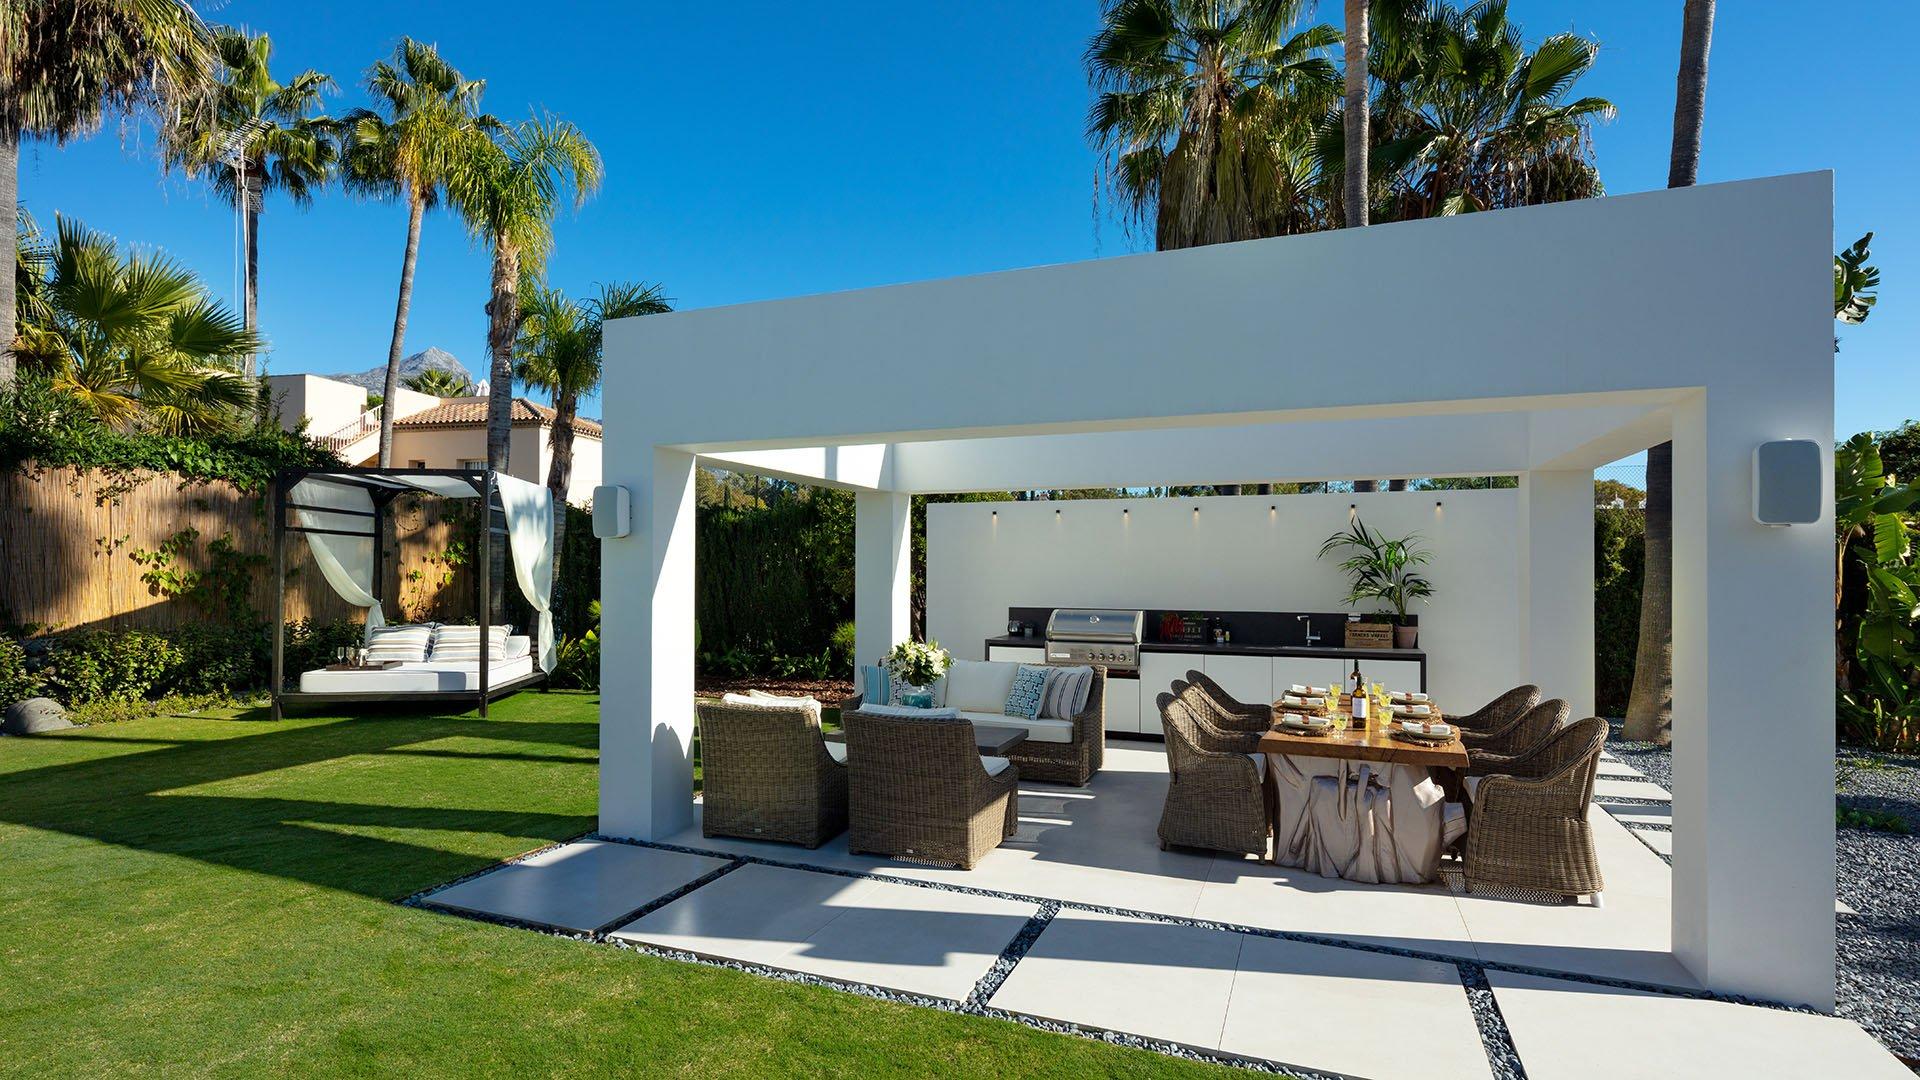 Villa Bodega: Impressive villa in the very heart of Nueva Andalucía, Marbella